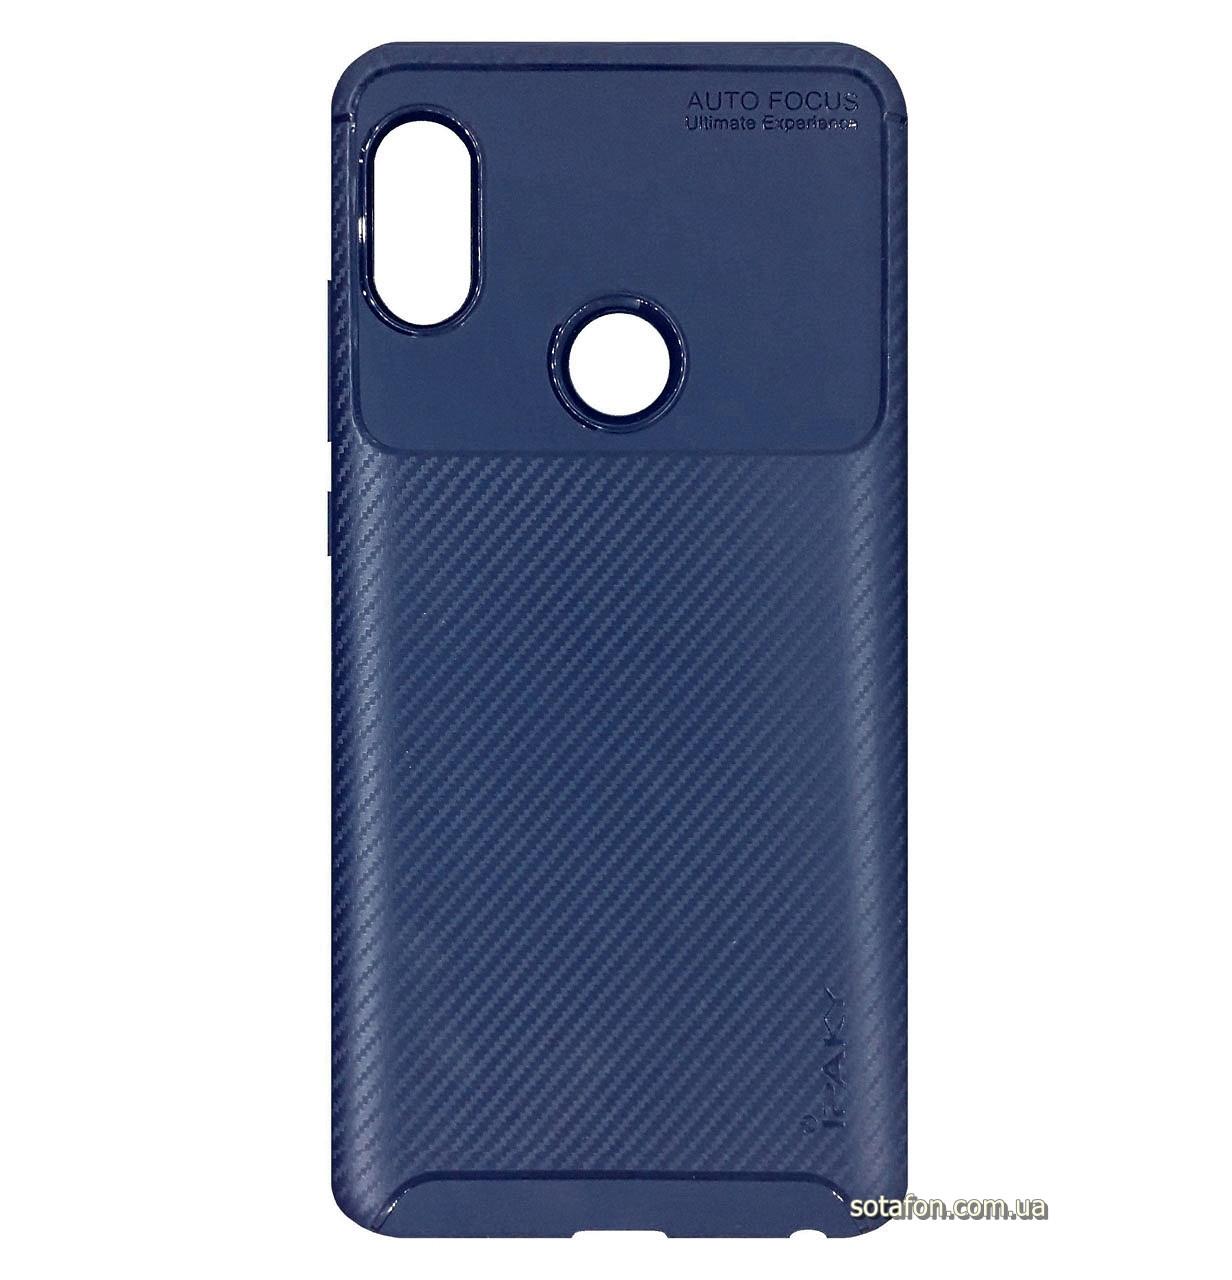 Противоударный TPU чехол iPaky Kaisy Series для Xiaomi Redmi Note 5 Pro / Note 5 (AI DC) Dark Blue